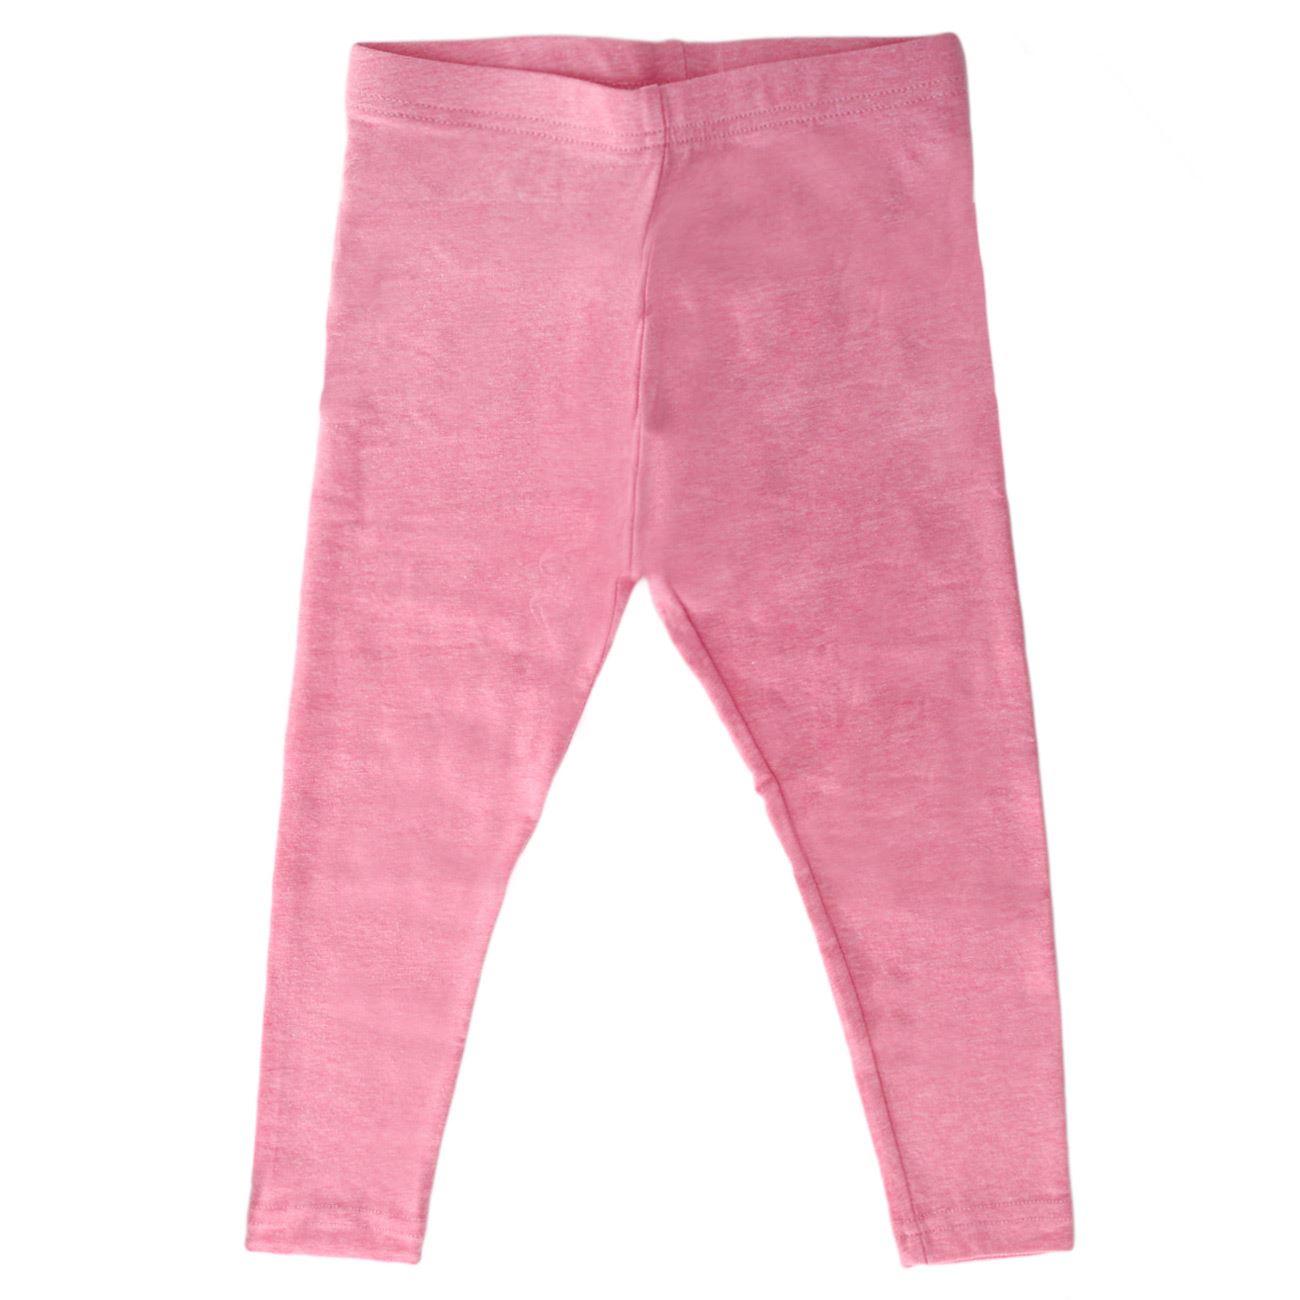 3e23c5589b58 Κολάν Παιδικό Ροζ < Κολάν για Κορίτσια | Jumbo